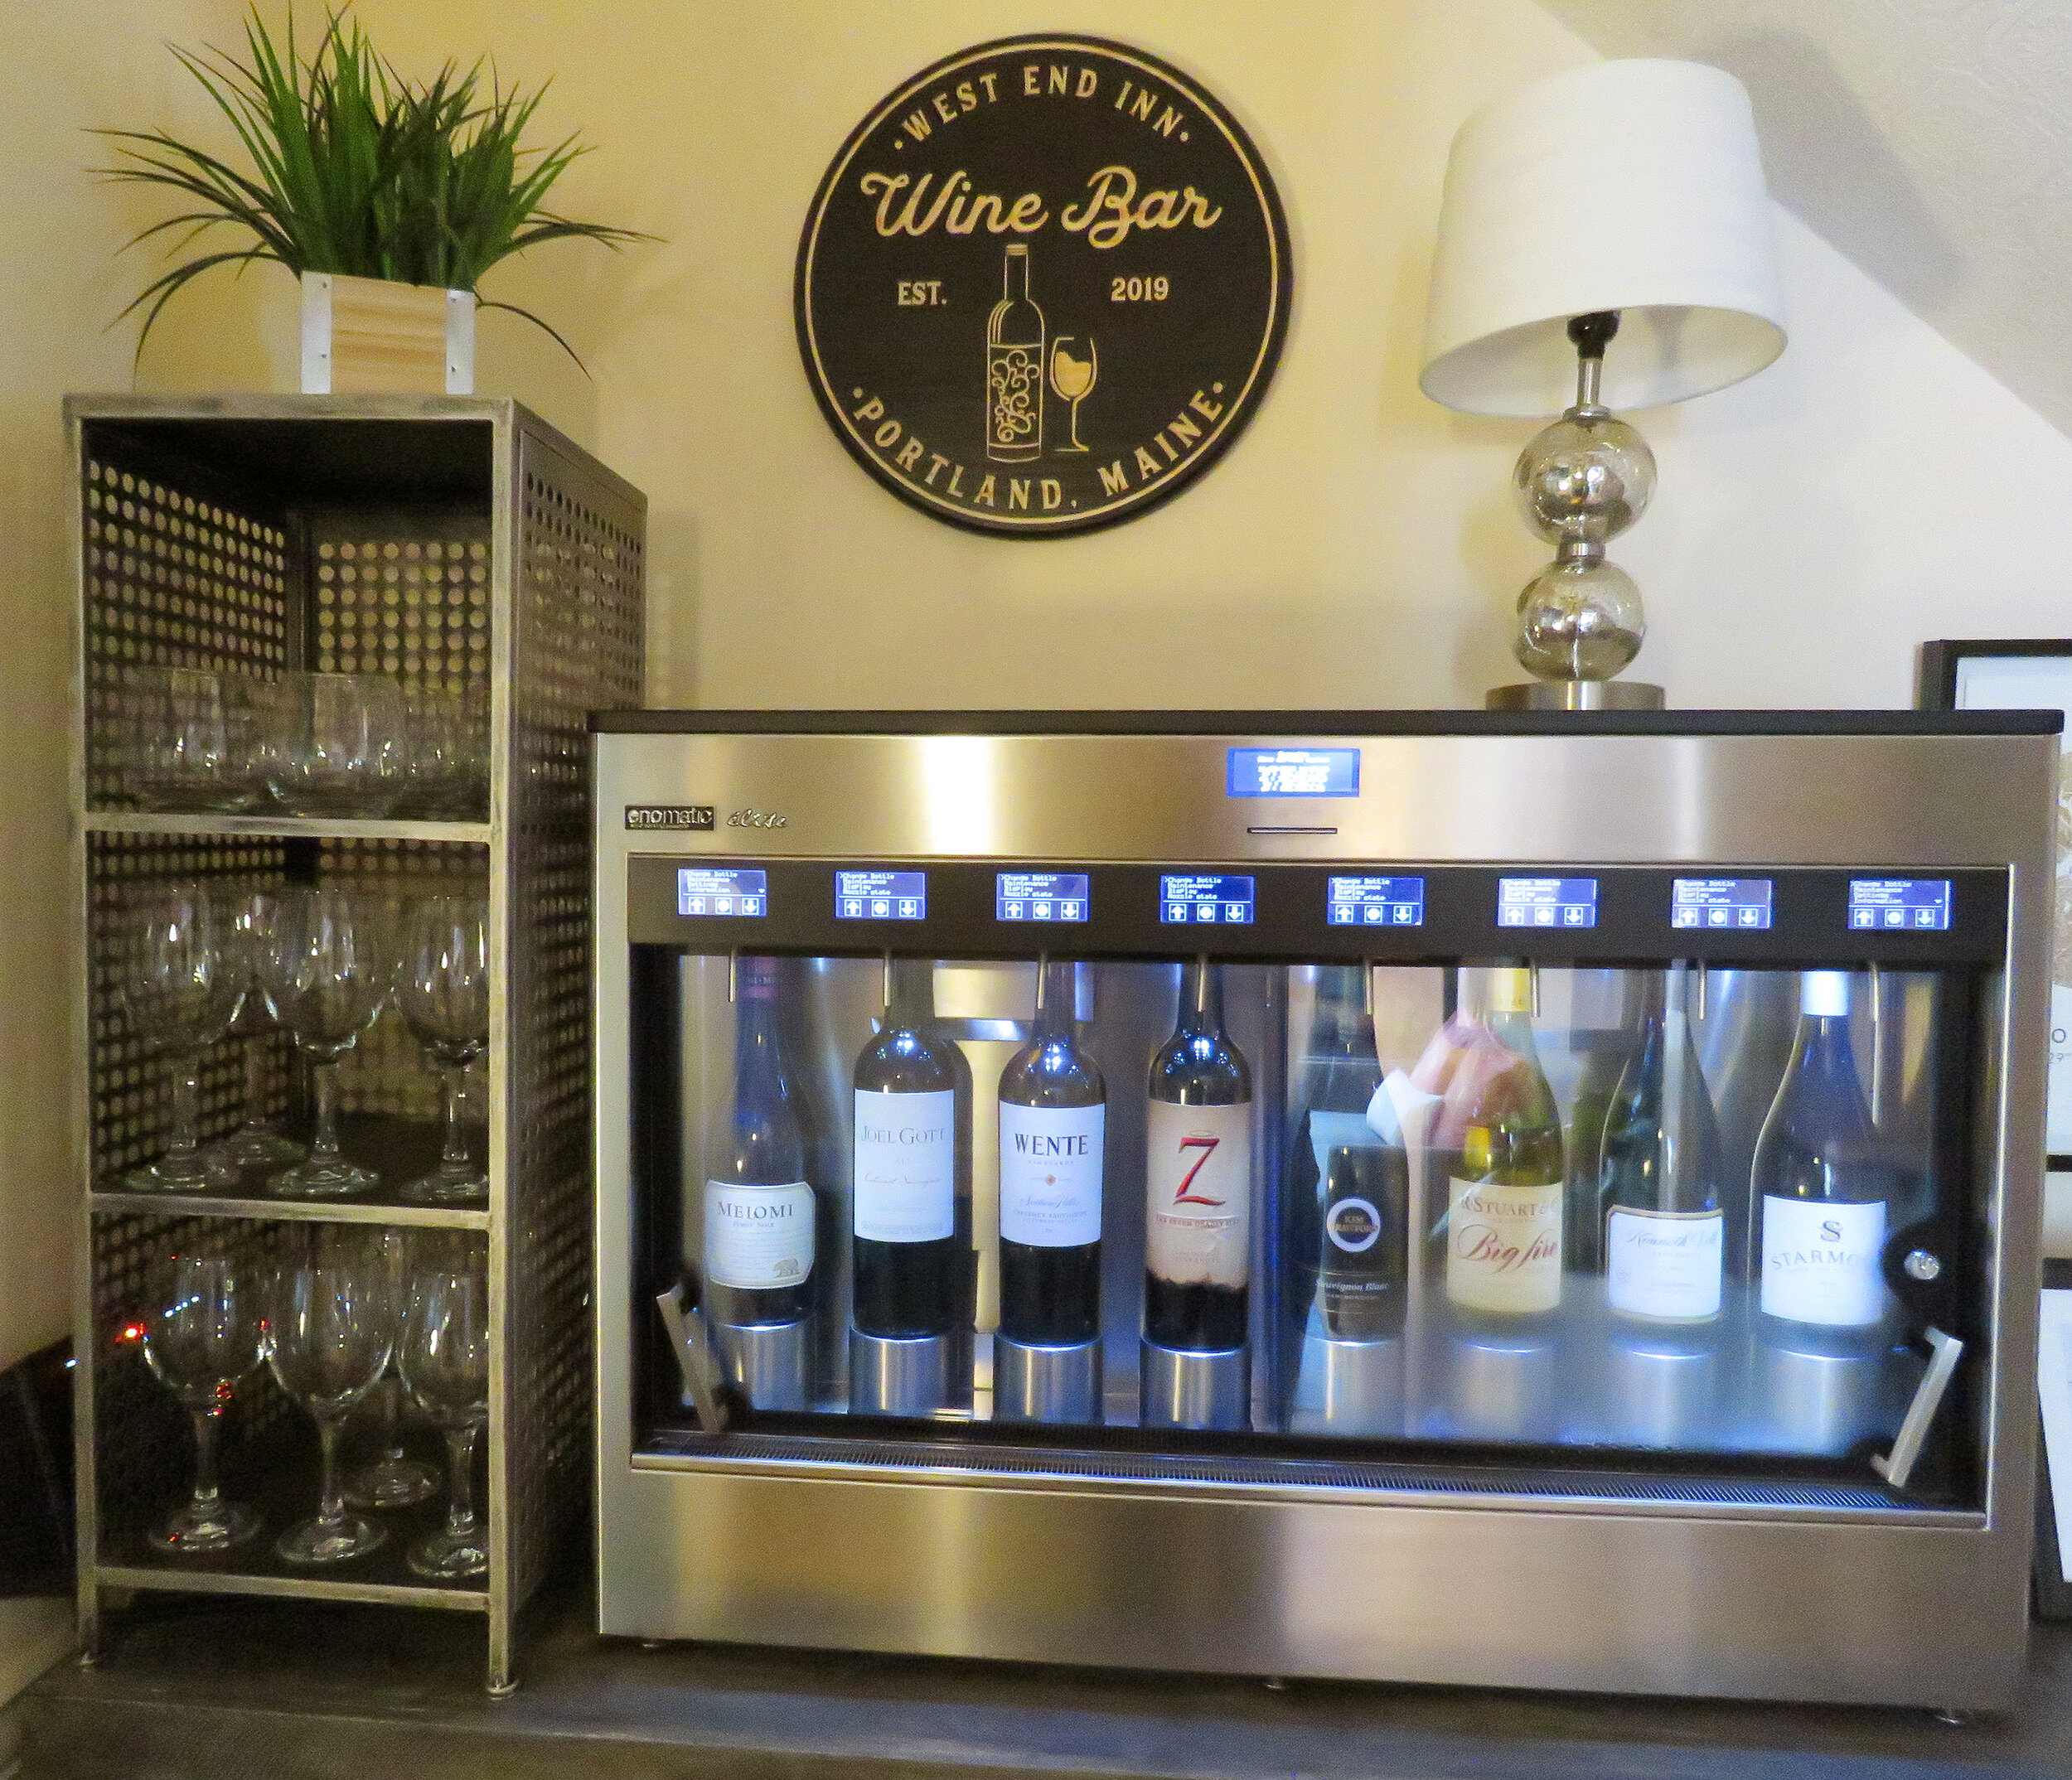 winebar.jpg